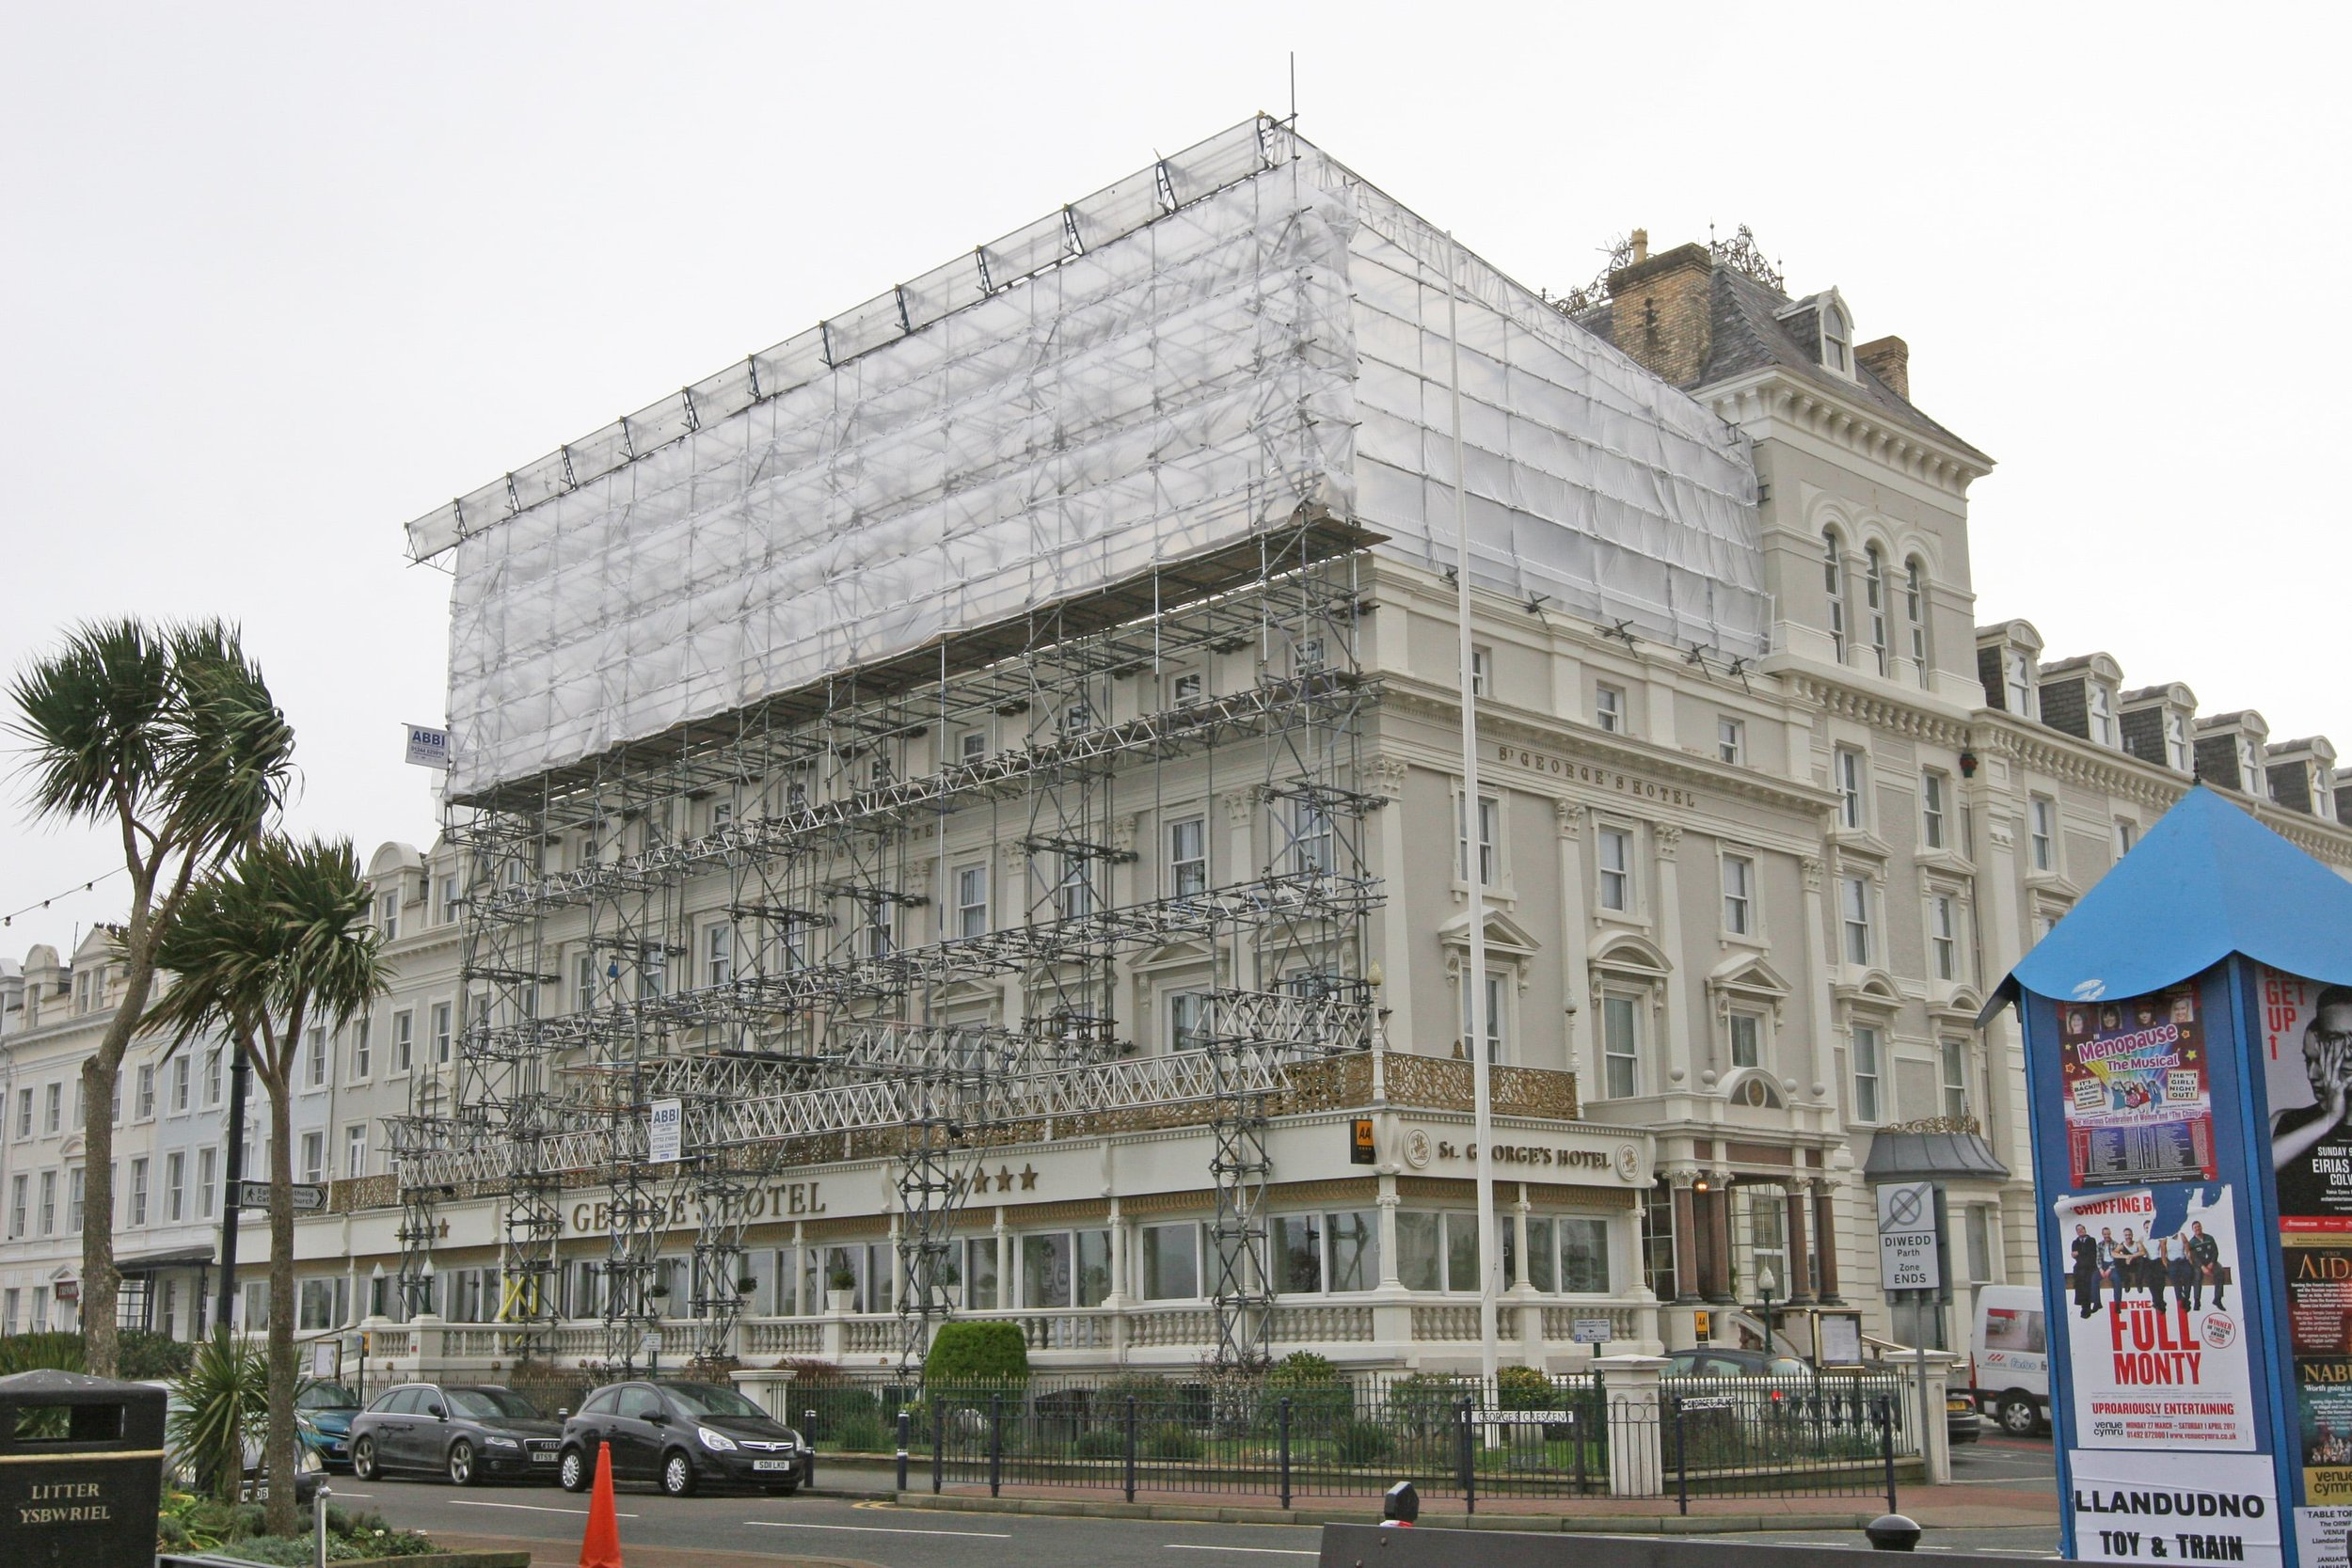 Temporary works scaffolding design